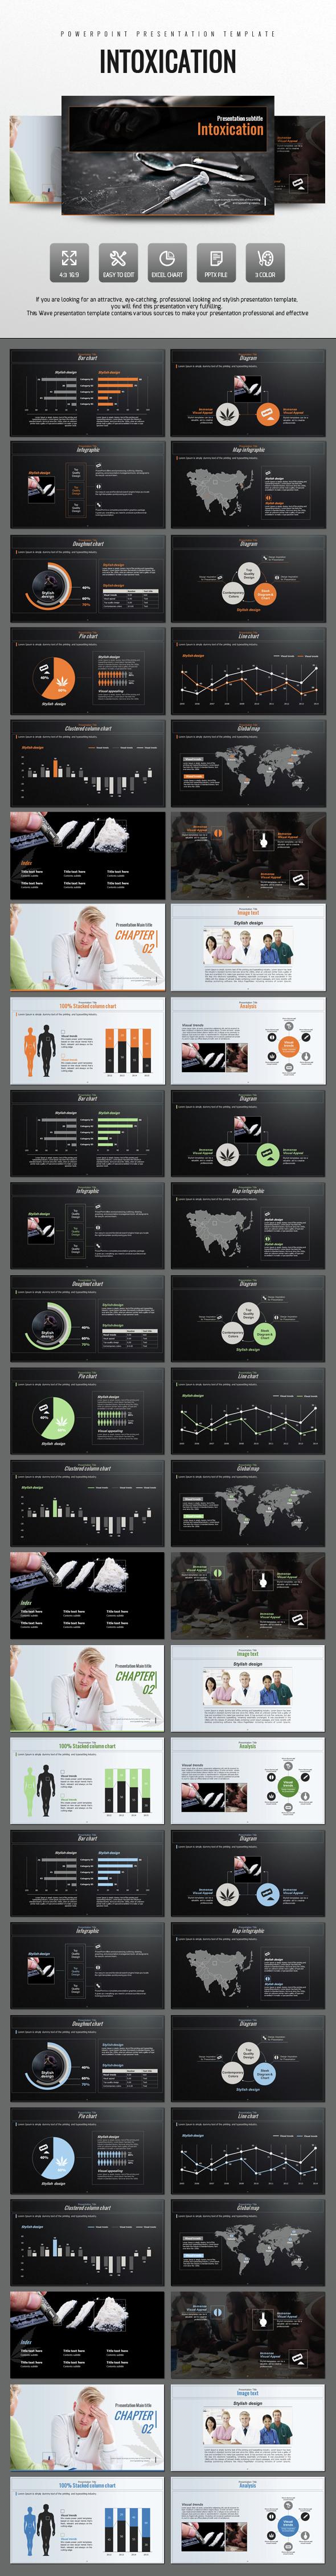 Intoxication PowerPoint - PowerPoint Templates Presentation Templates